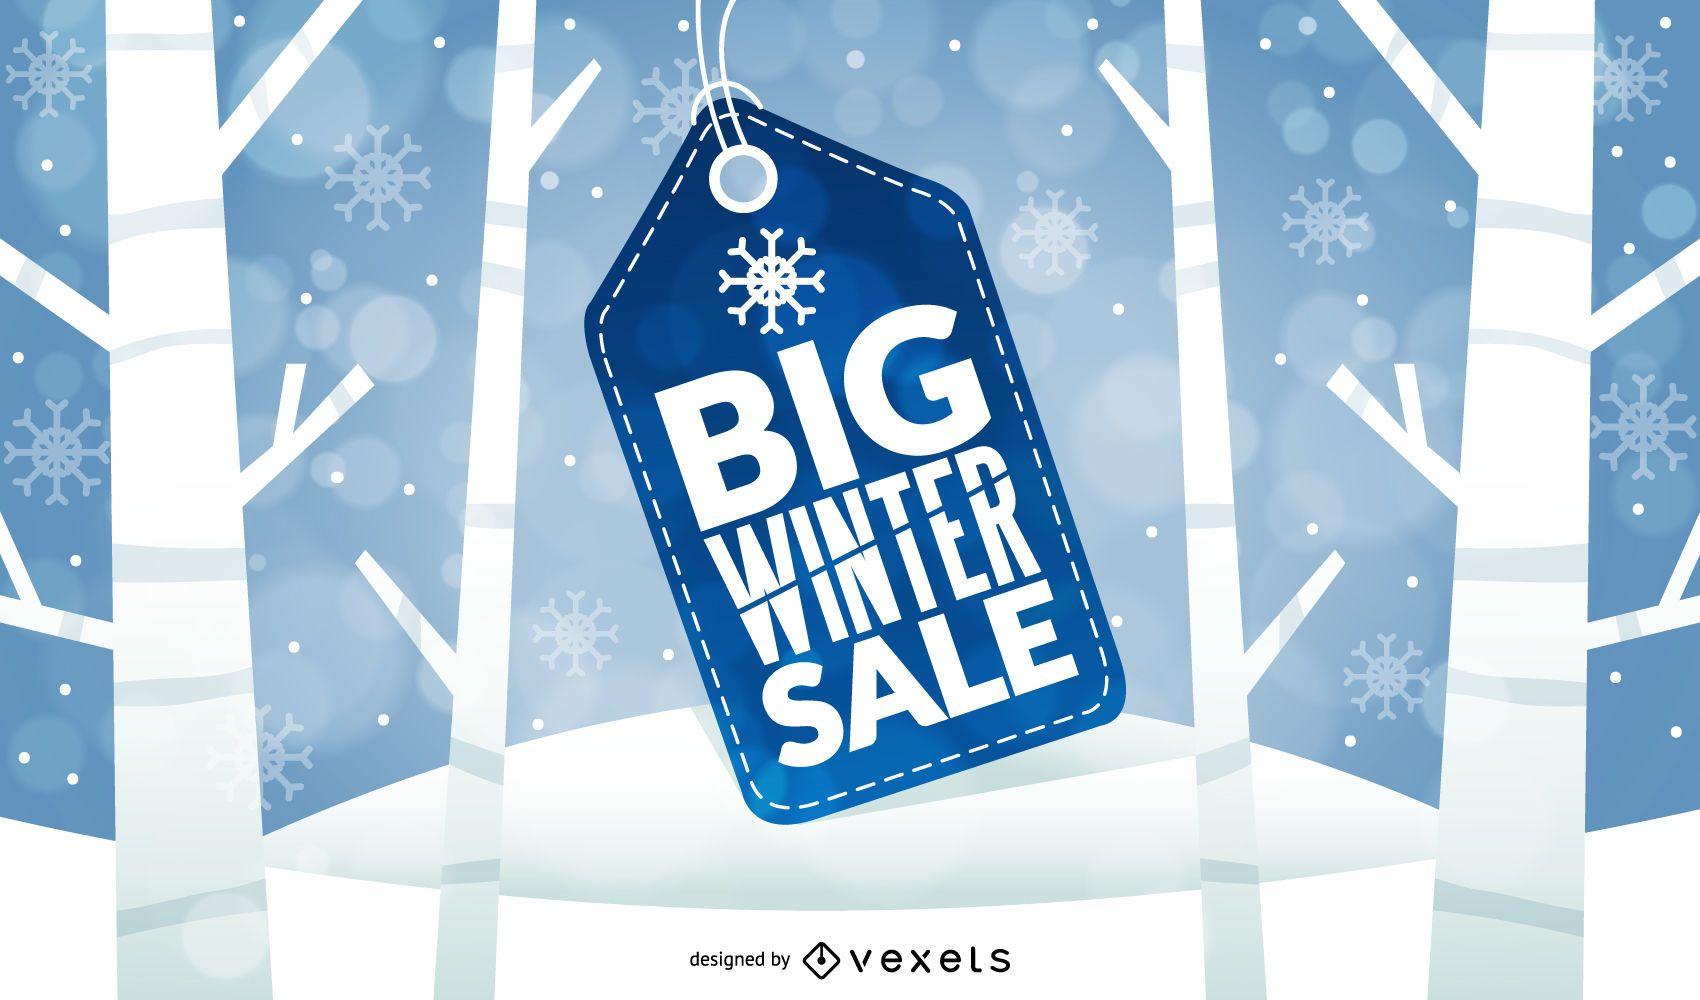 Big Winter Sale Price Tag Design